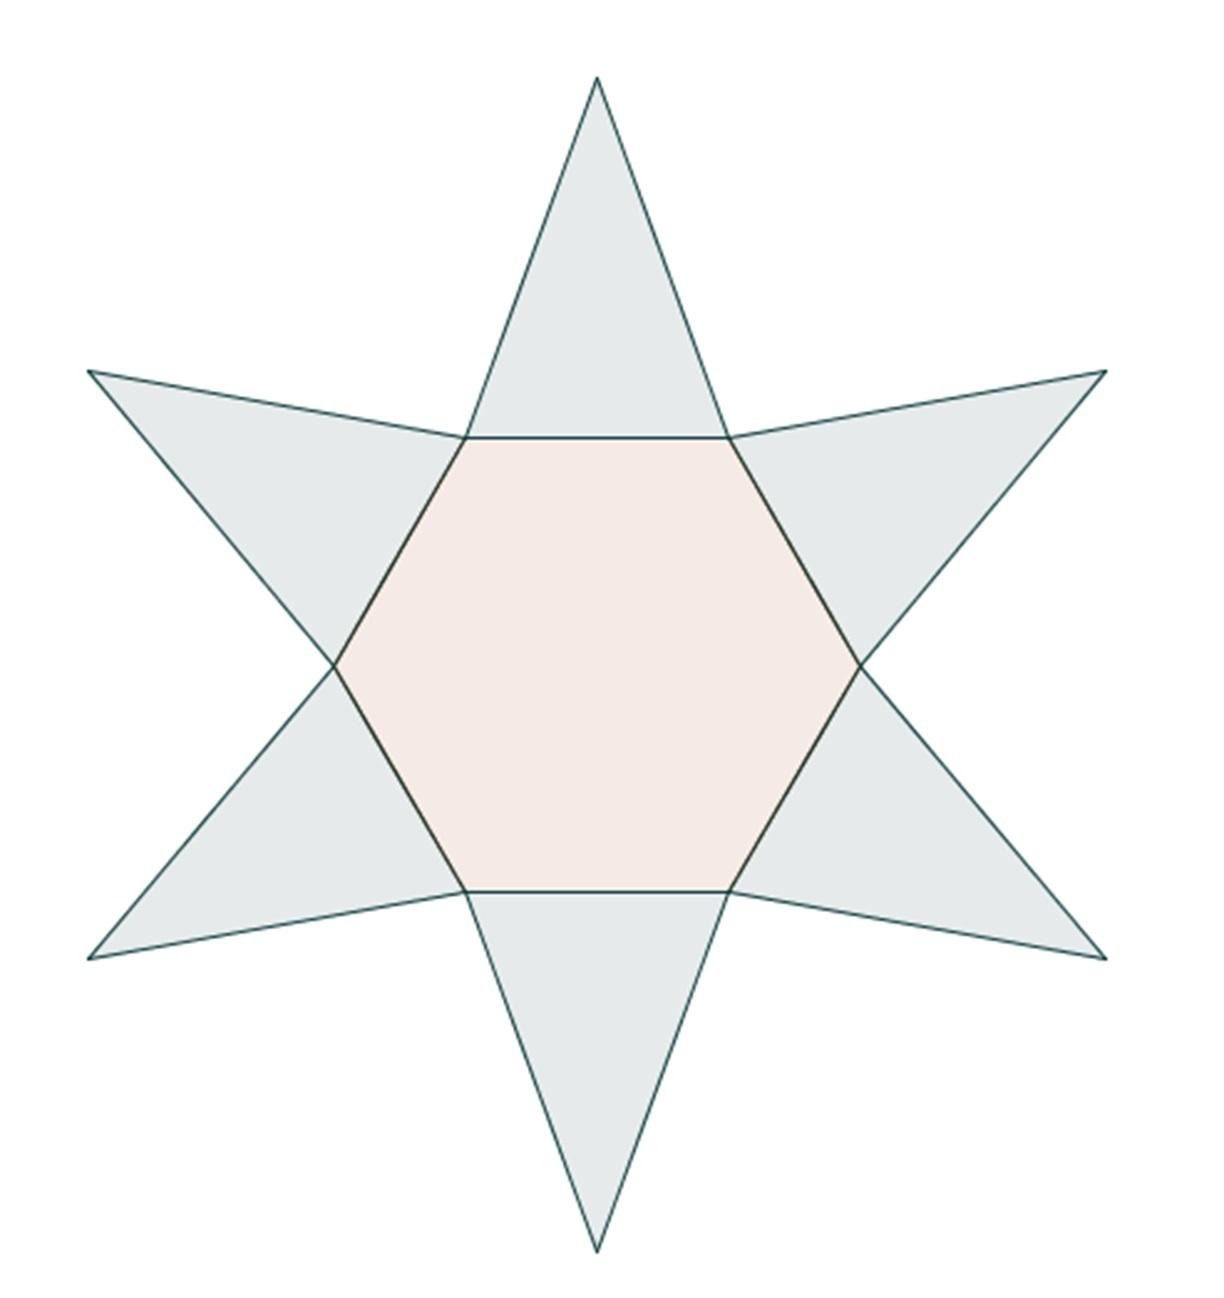 Drawn pyramid regular Of net Type a figures